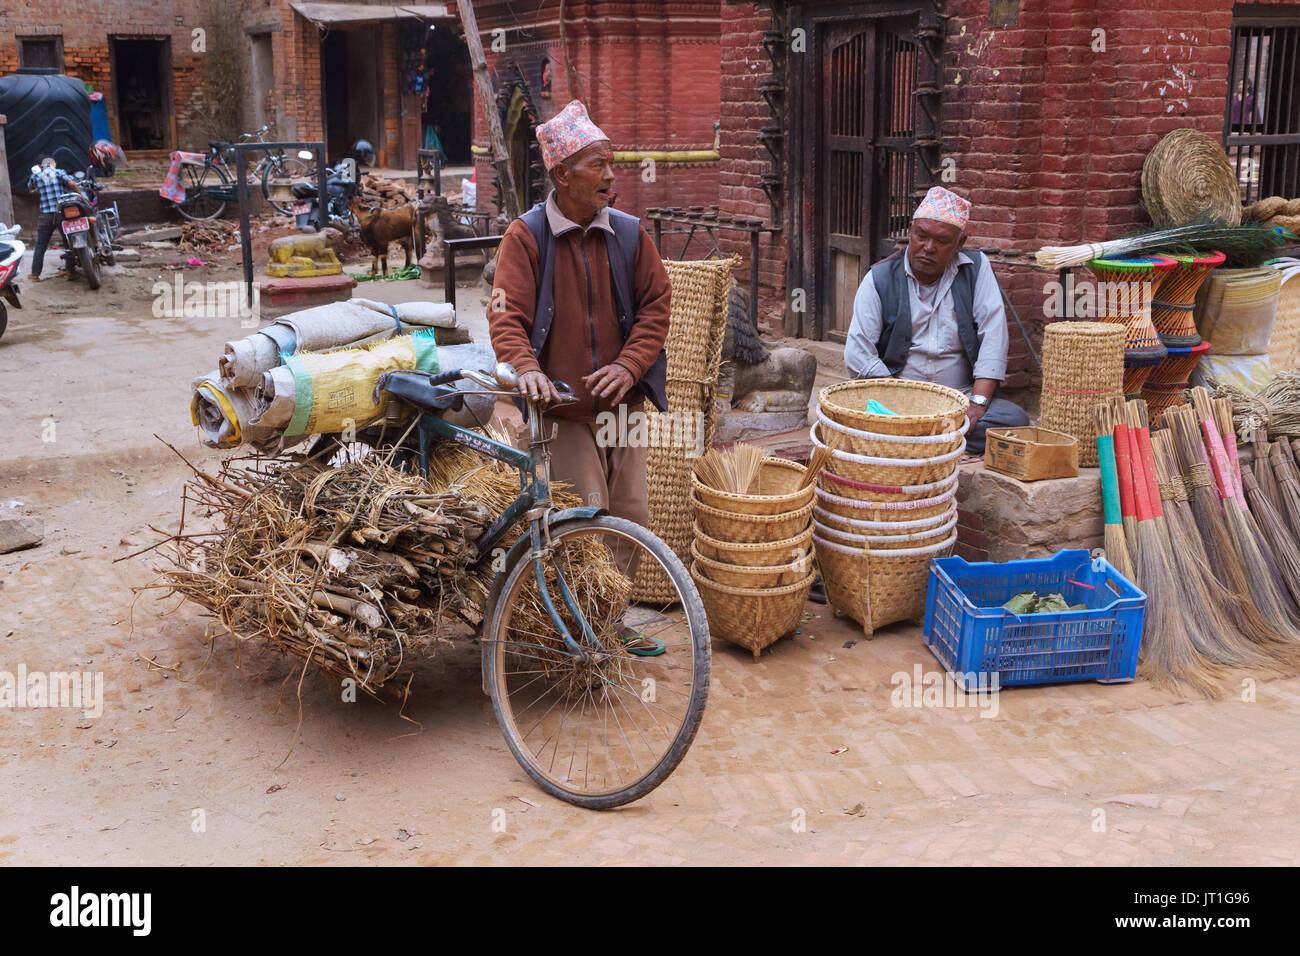 Street scene, Bhaktapur, Nepal. - Stock Image